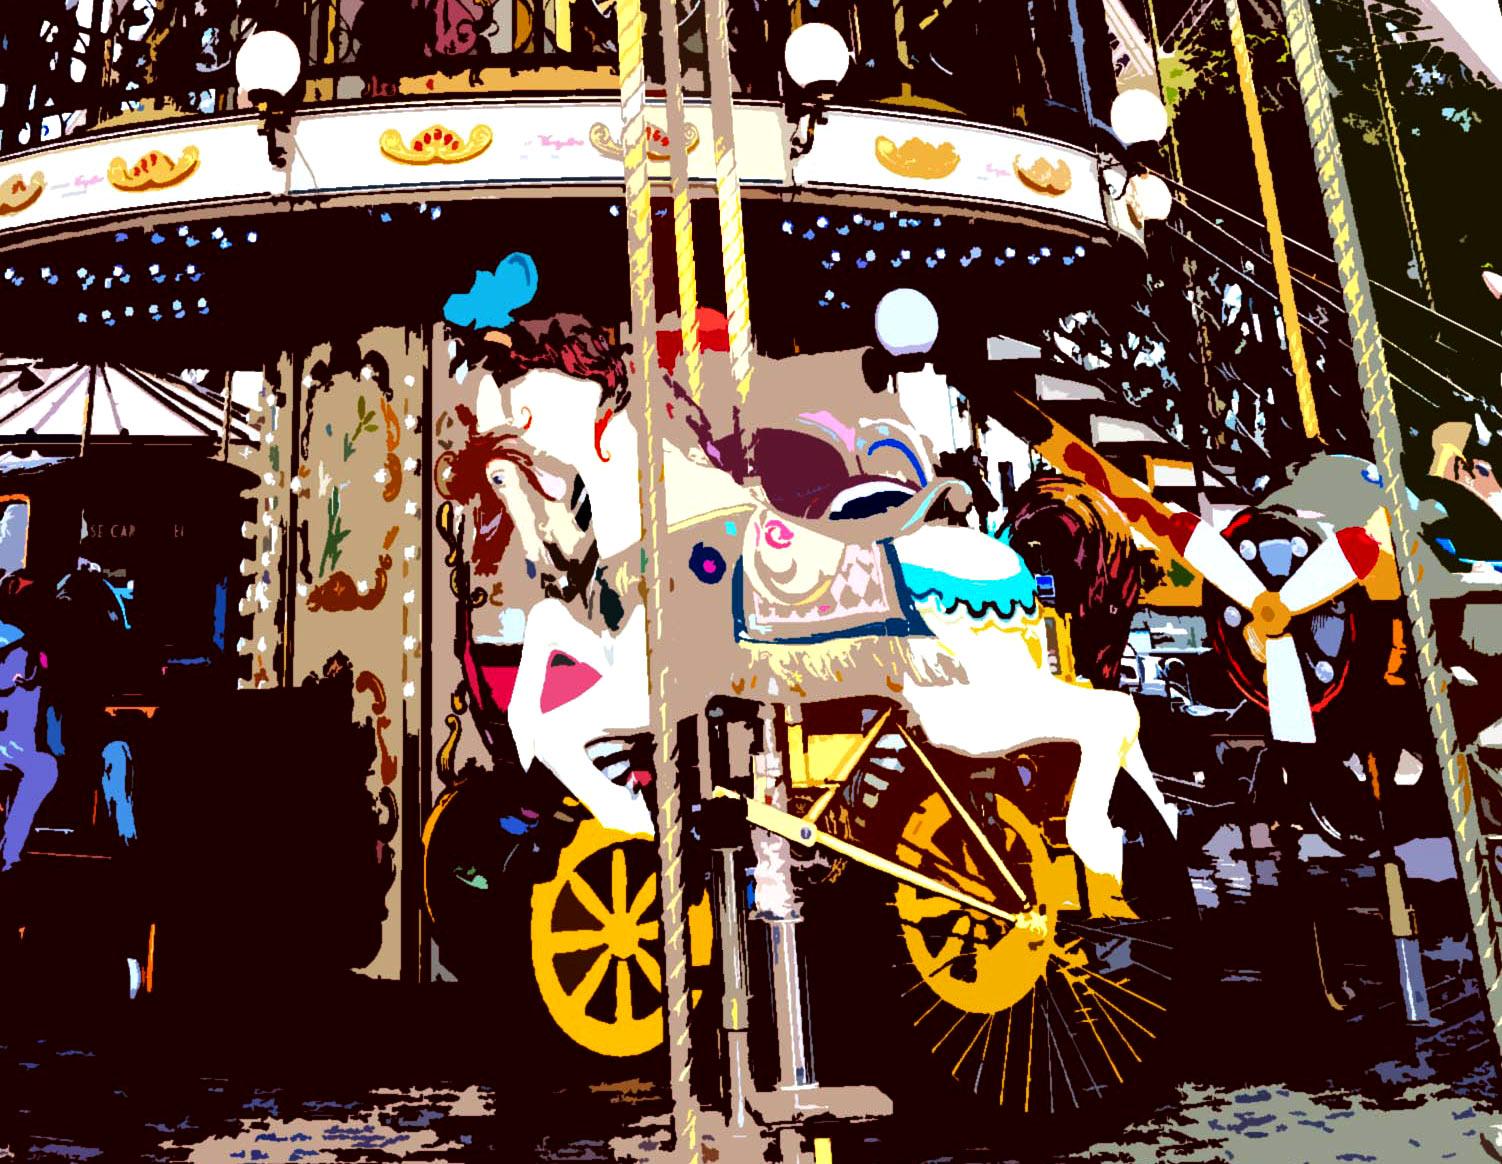 Ilustración gratis - Carrousel de París - Torre Eiffel